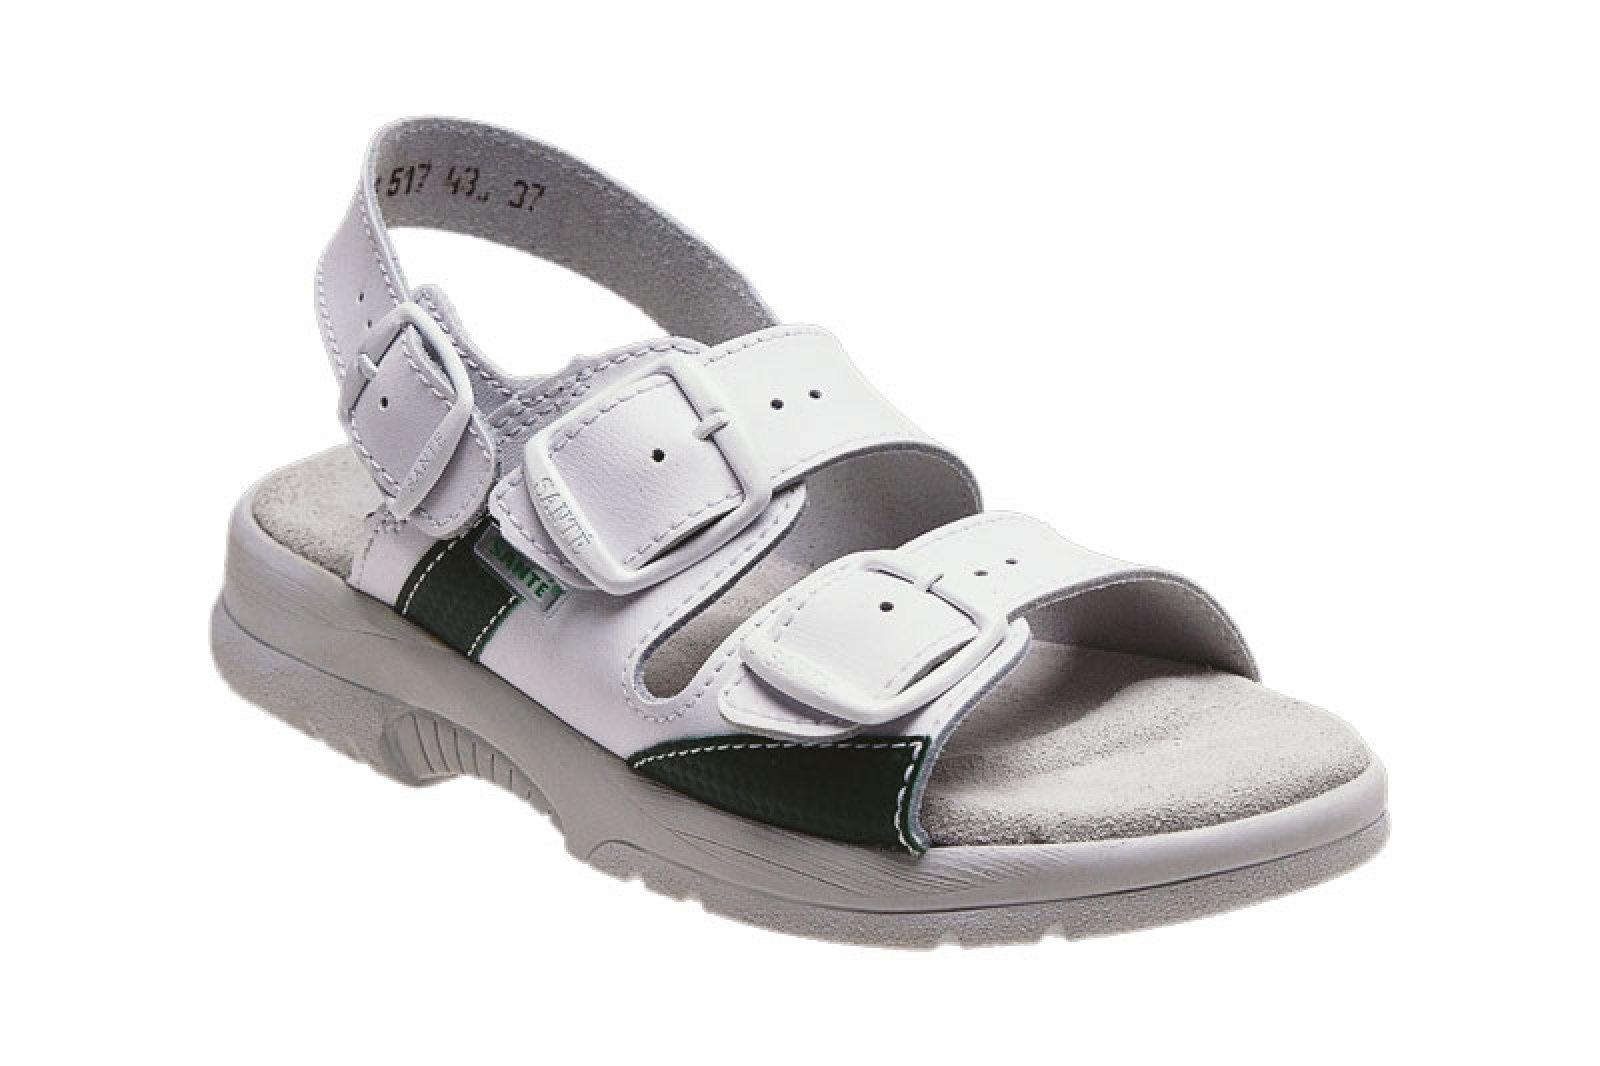 0fb8f58f48c4 dámské sandály Santé 517 43 10 bílé